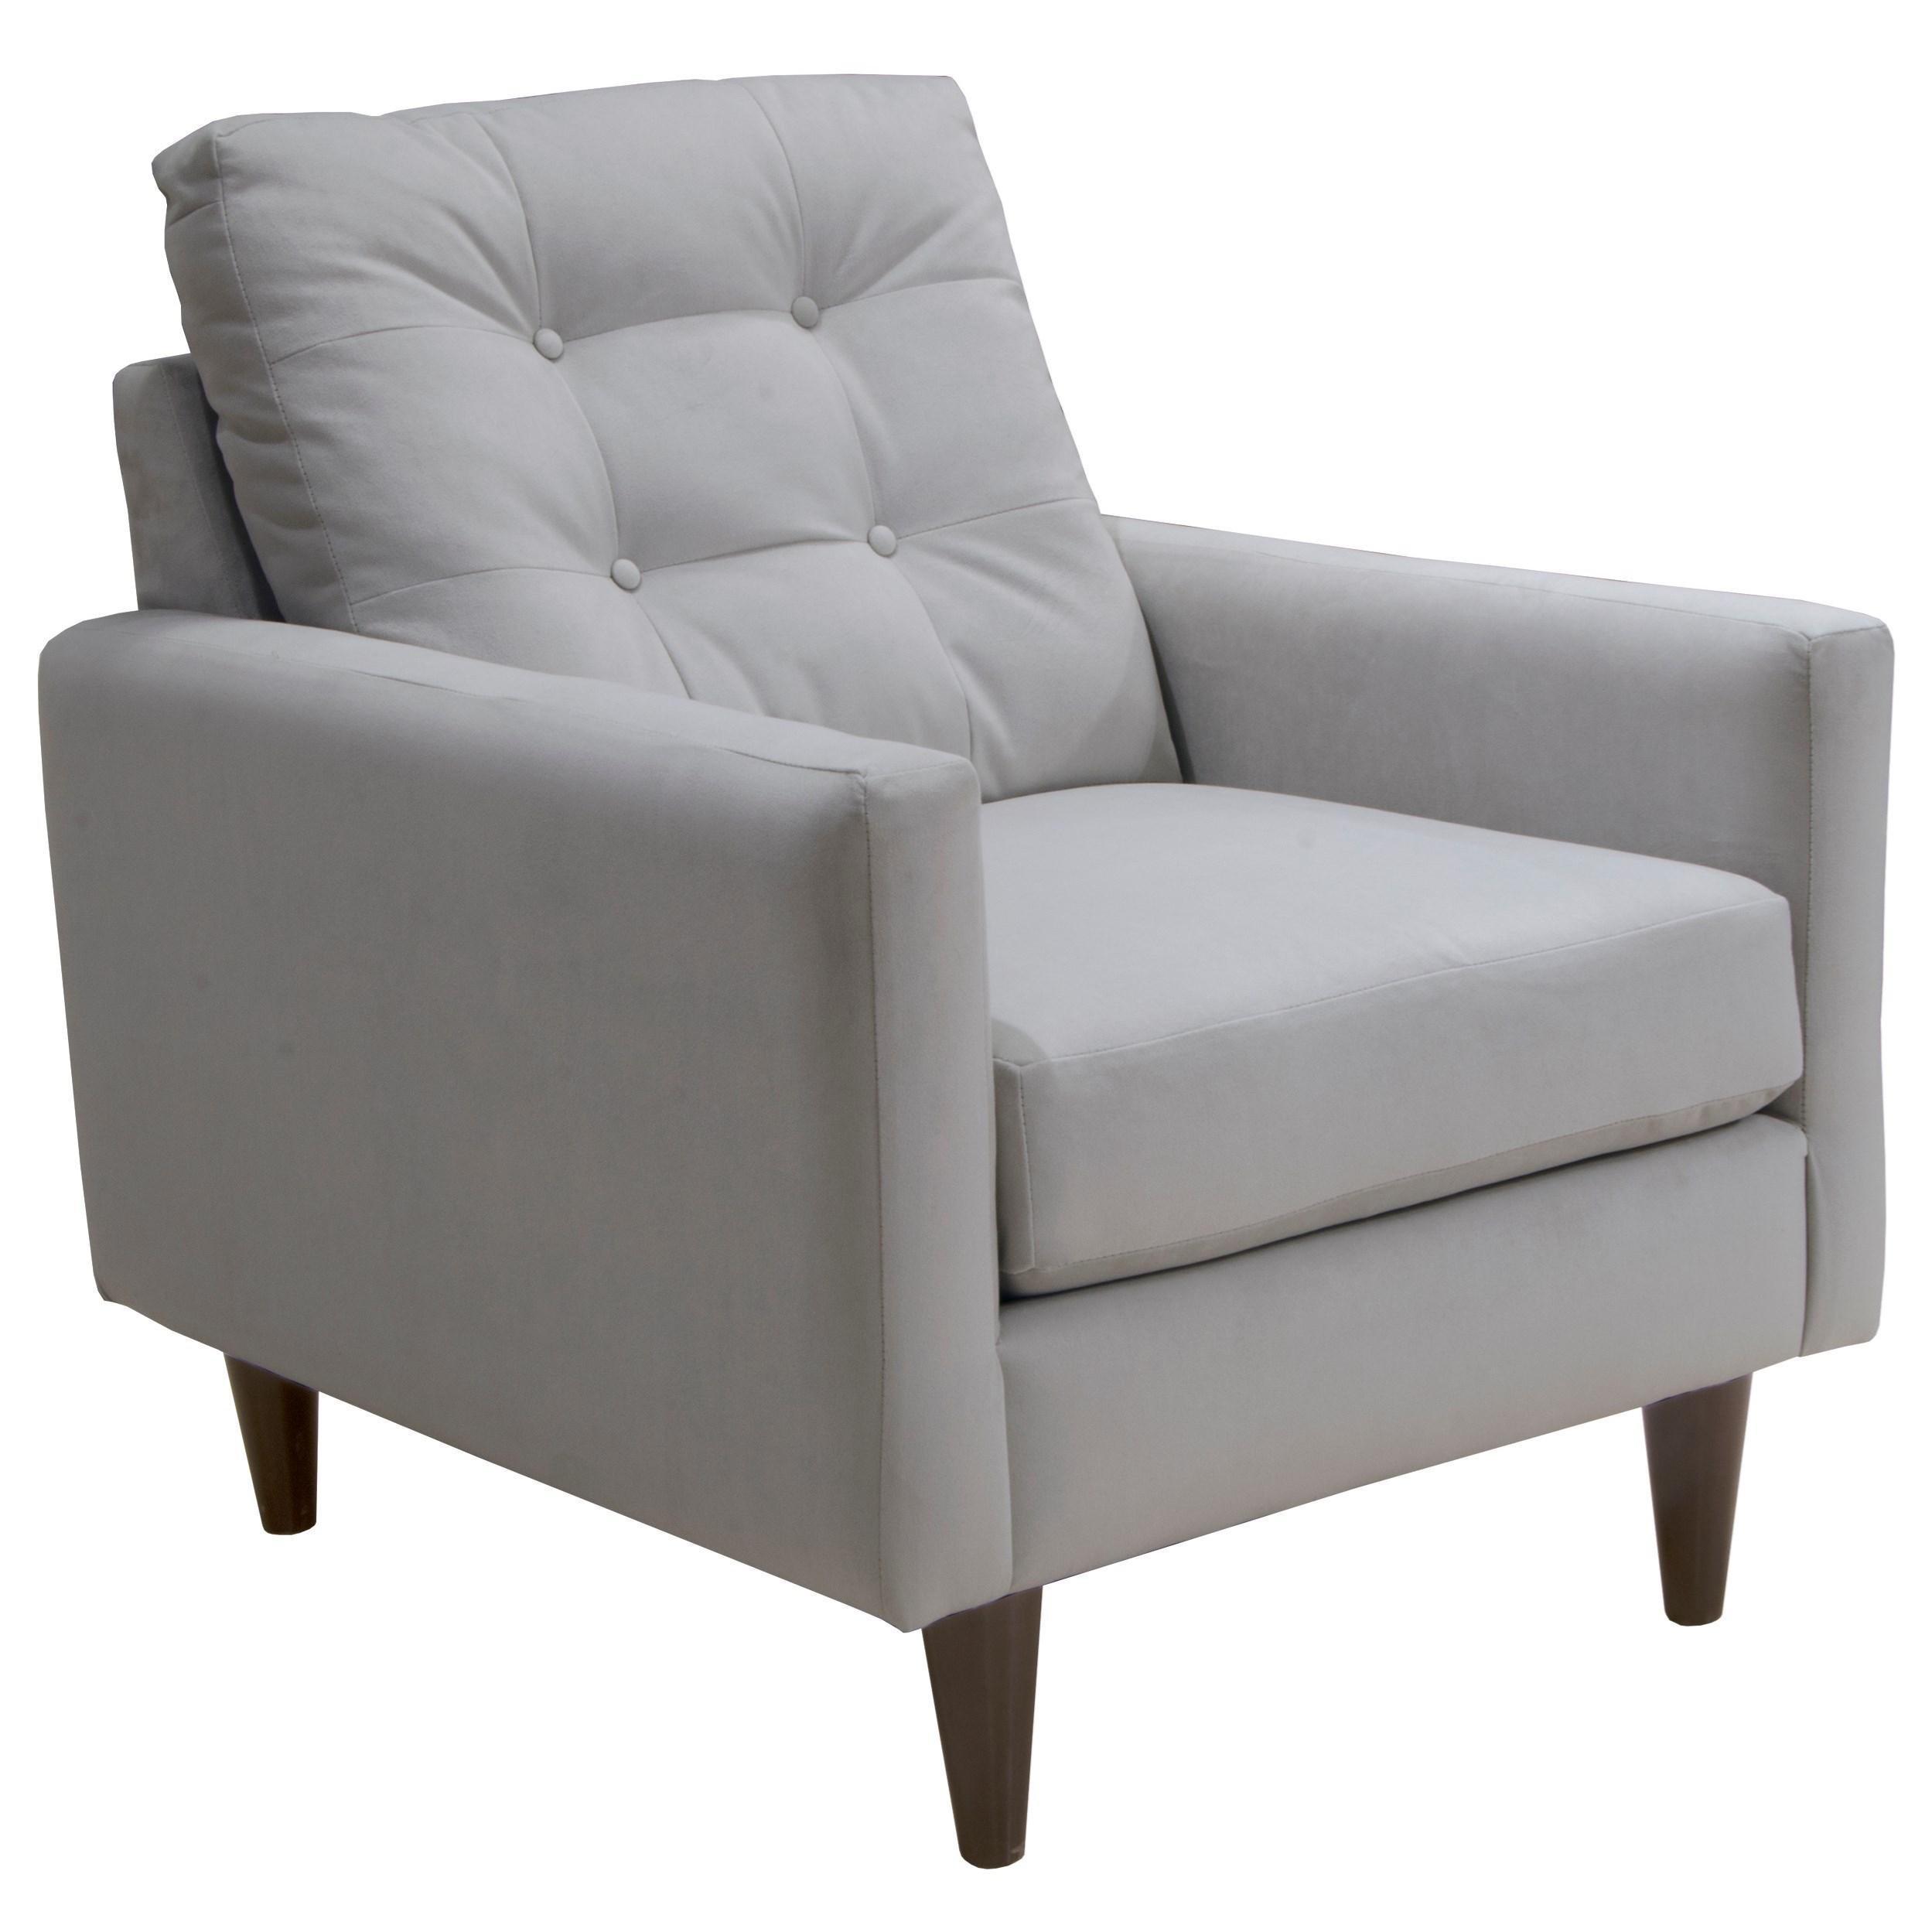 Beau Jackson Furniture HaleyUpholstered Chair ...